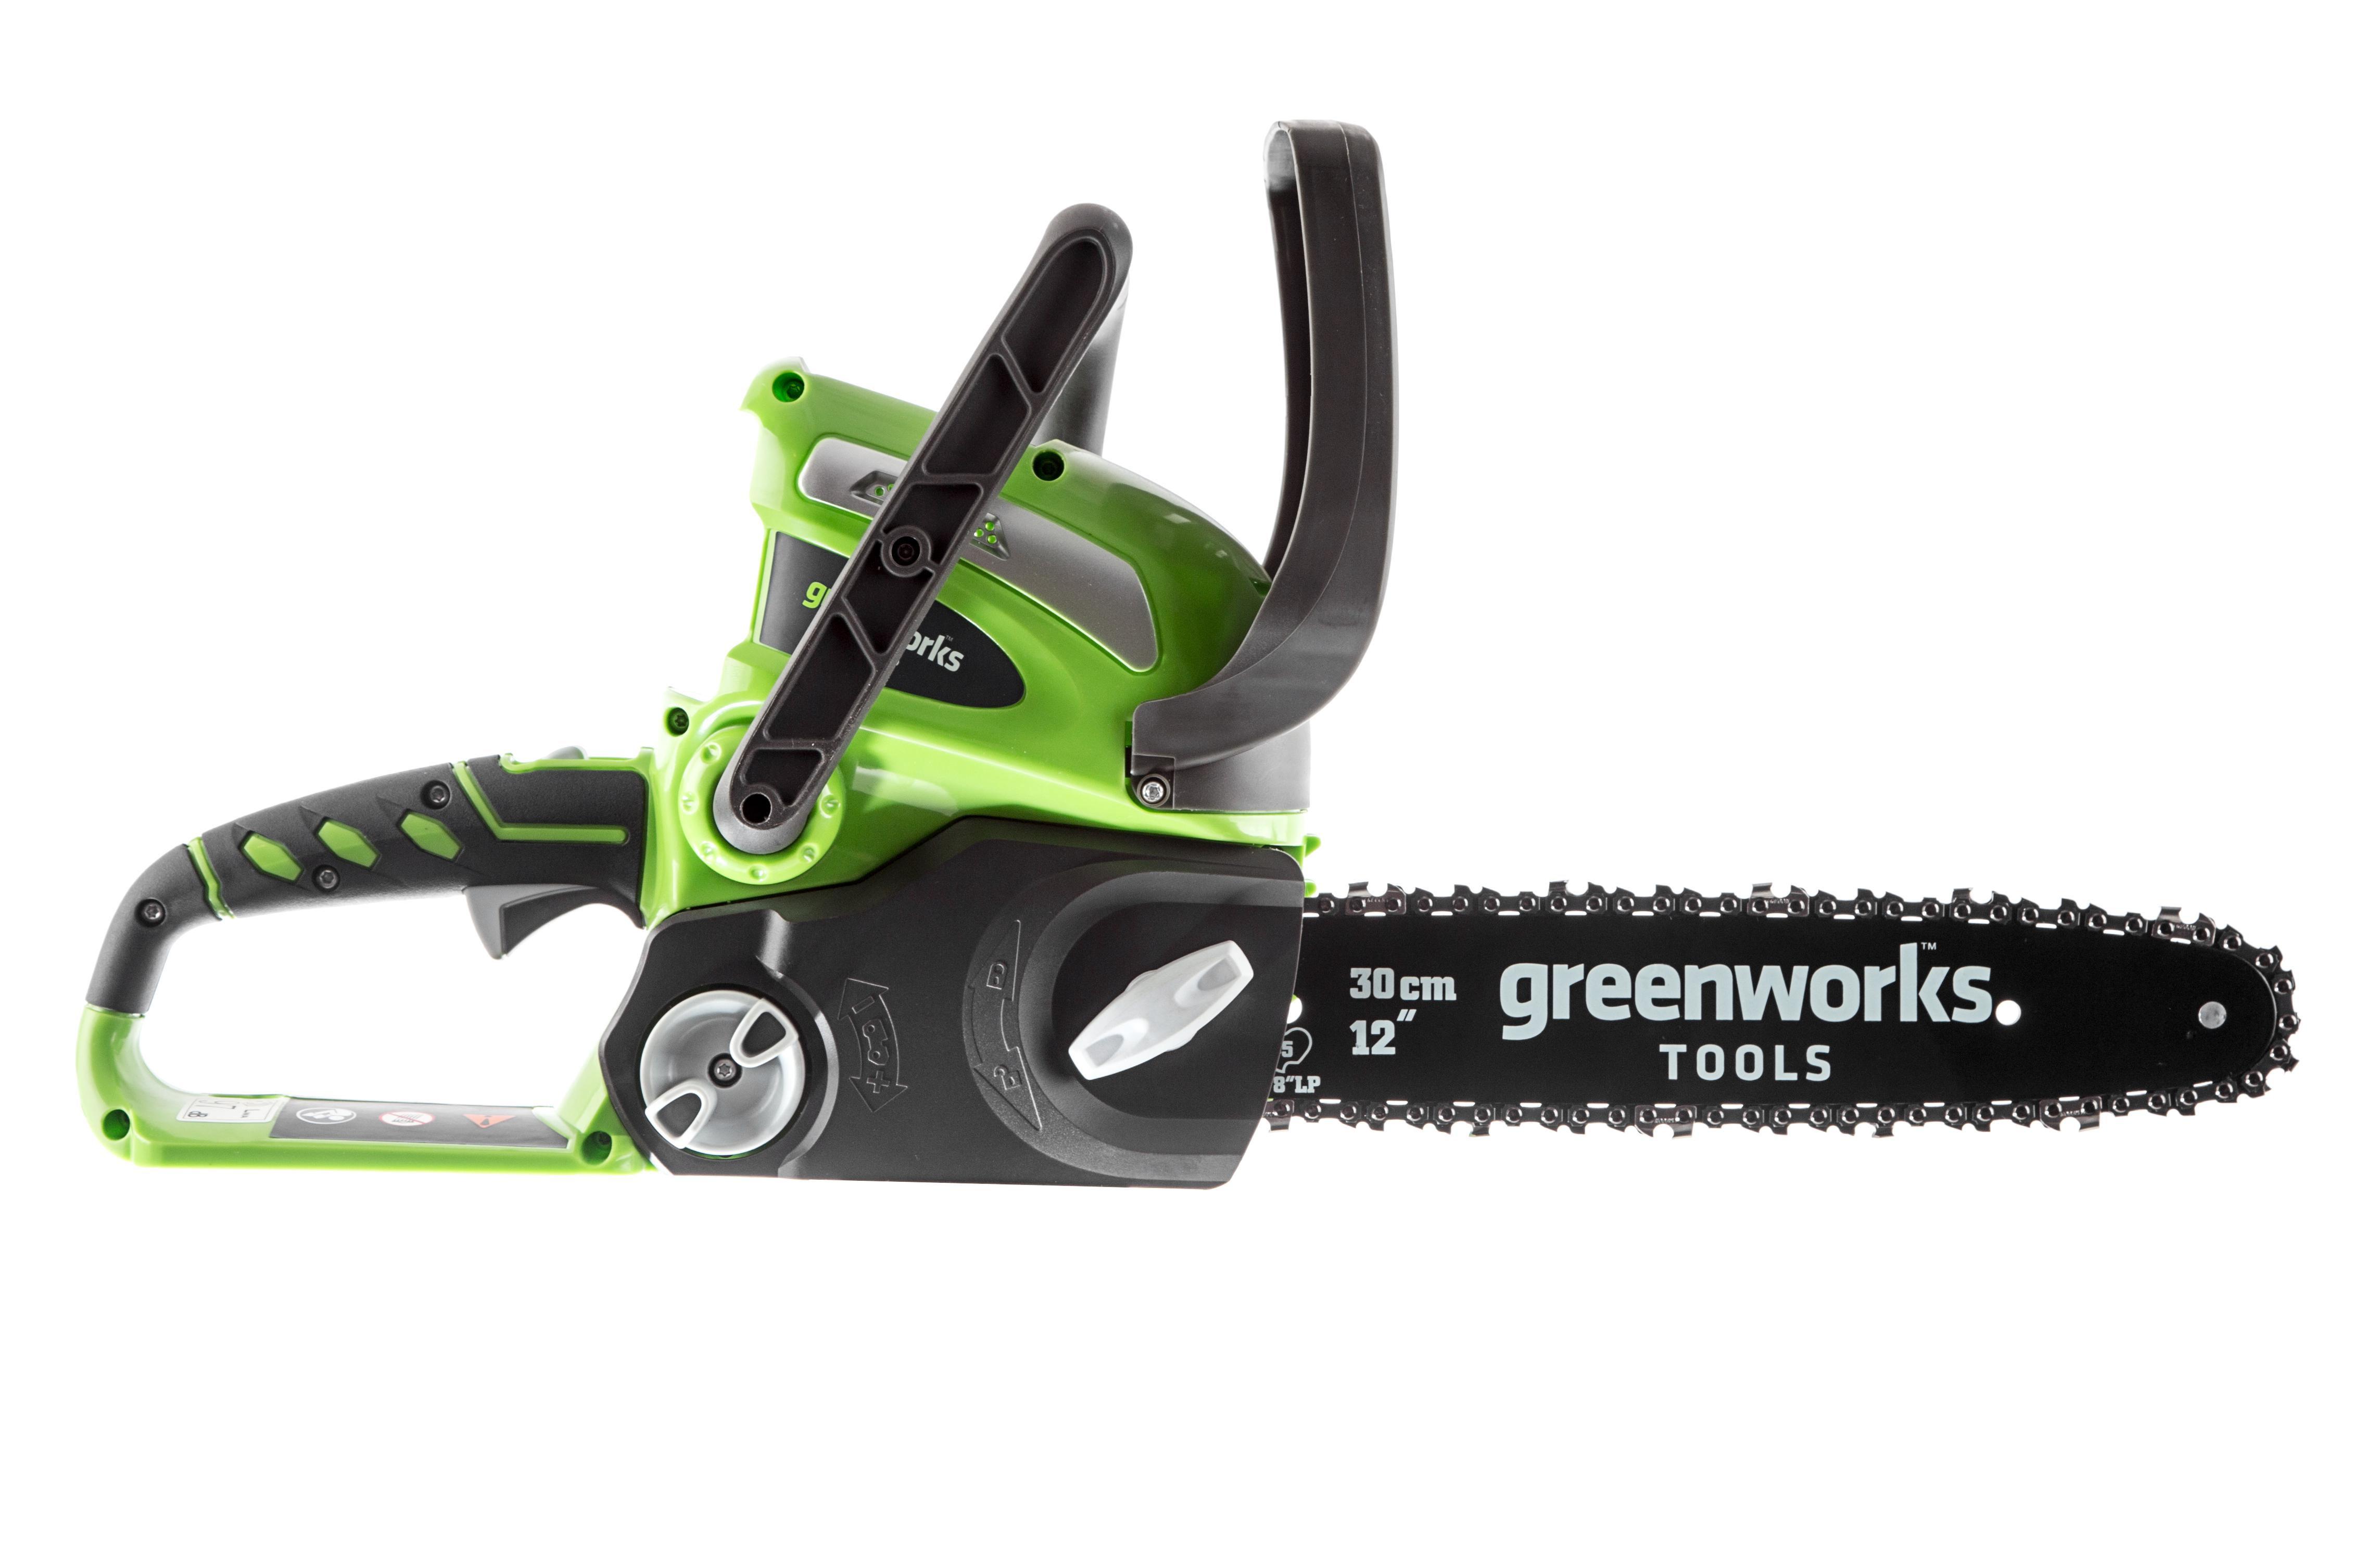 Пила цепная аккумуляторная Greenworks G40cs30 (20117) БЕЗ АККУМ и ЗУ